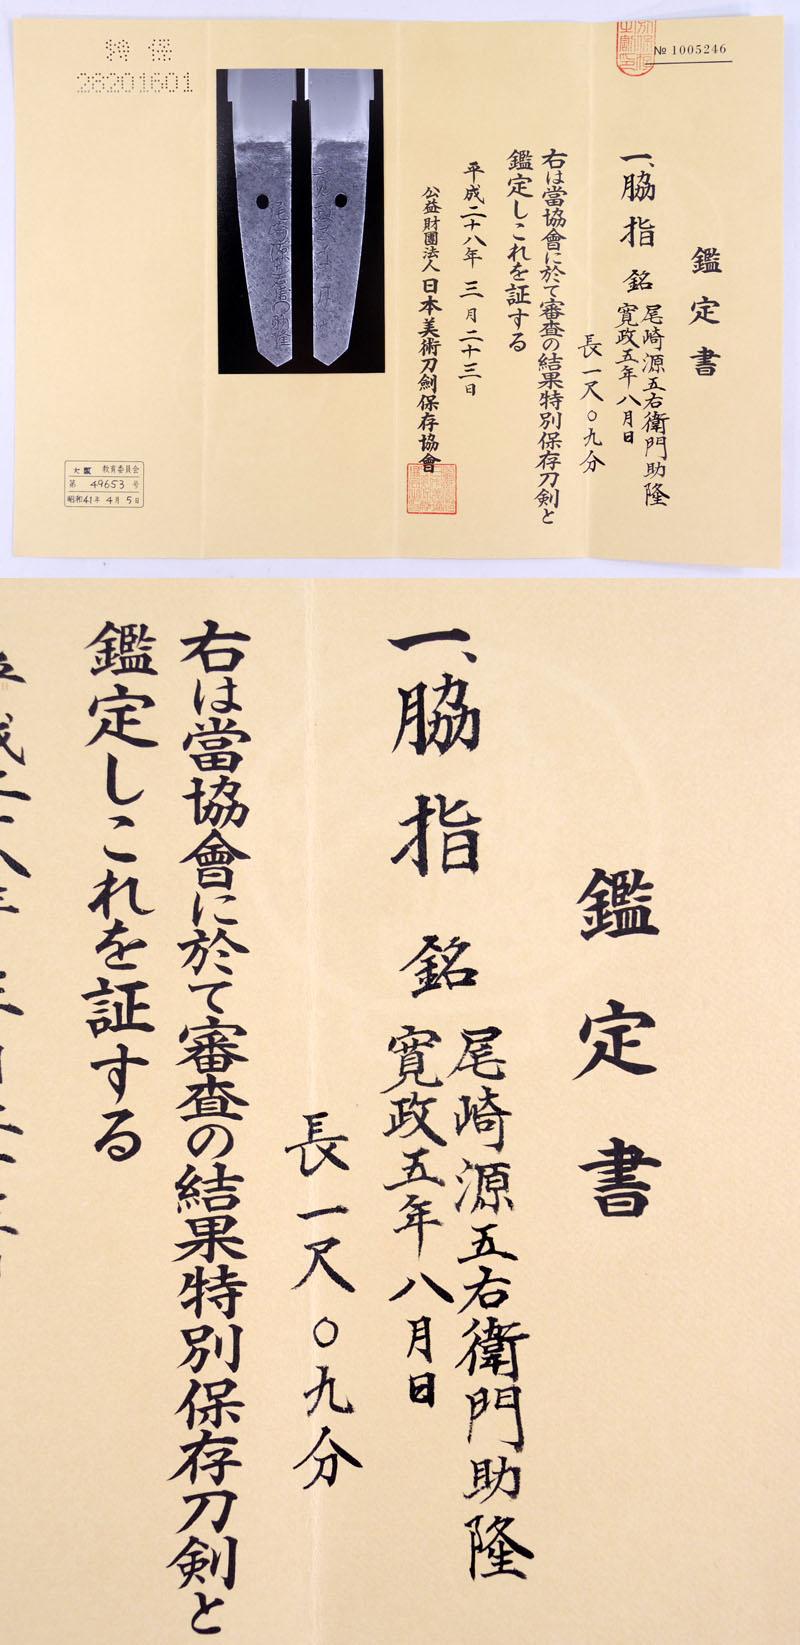 尾崎源五右衛門助隆 Picture of Certificate